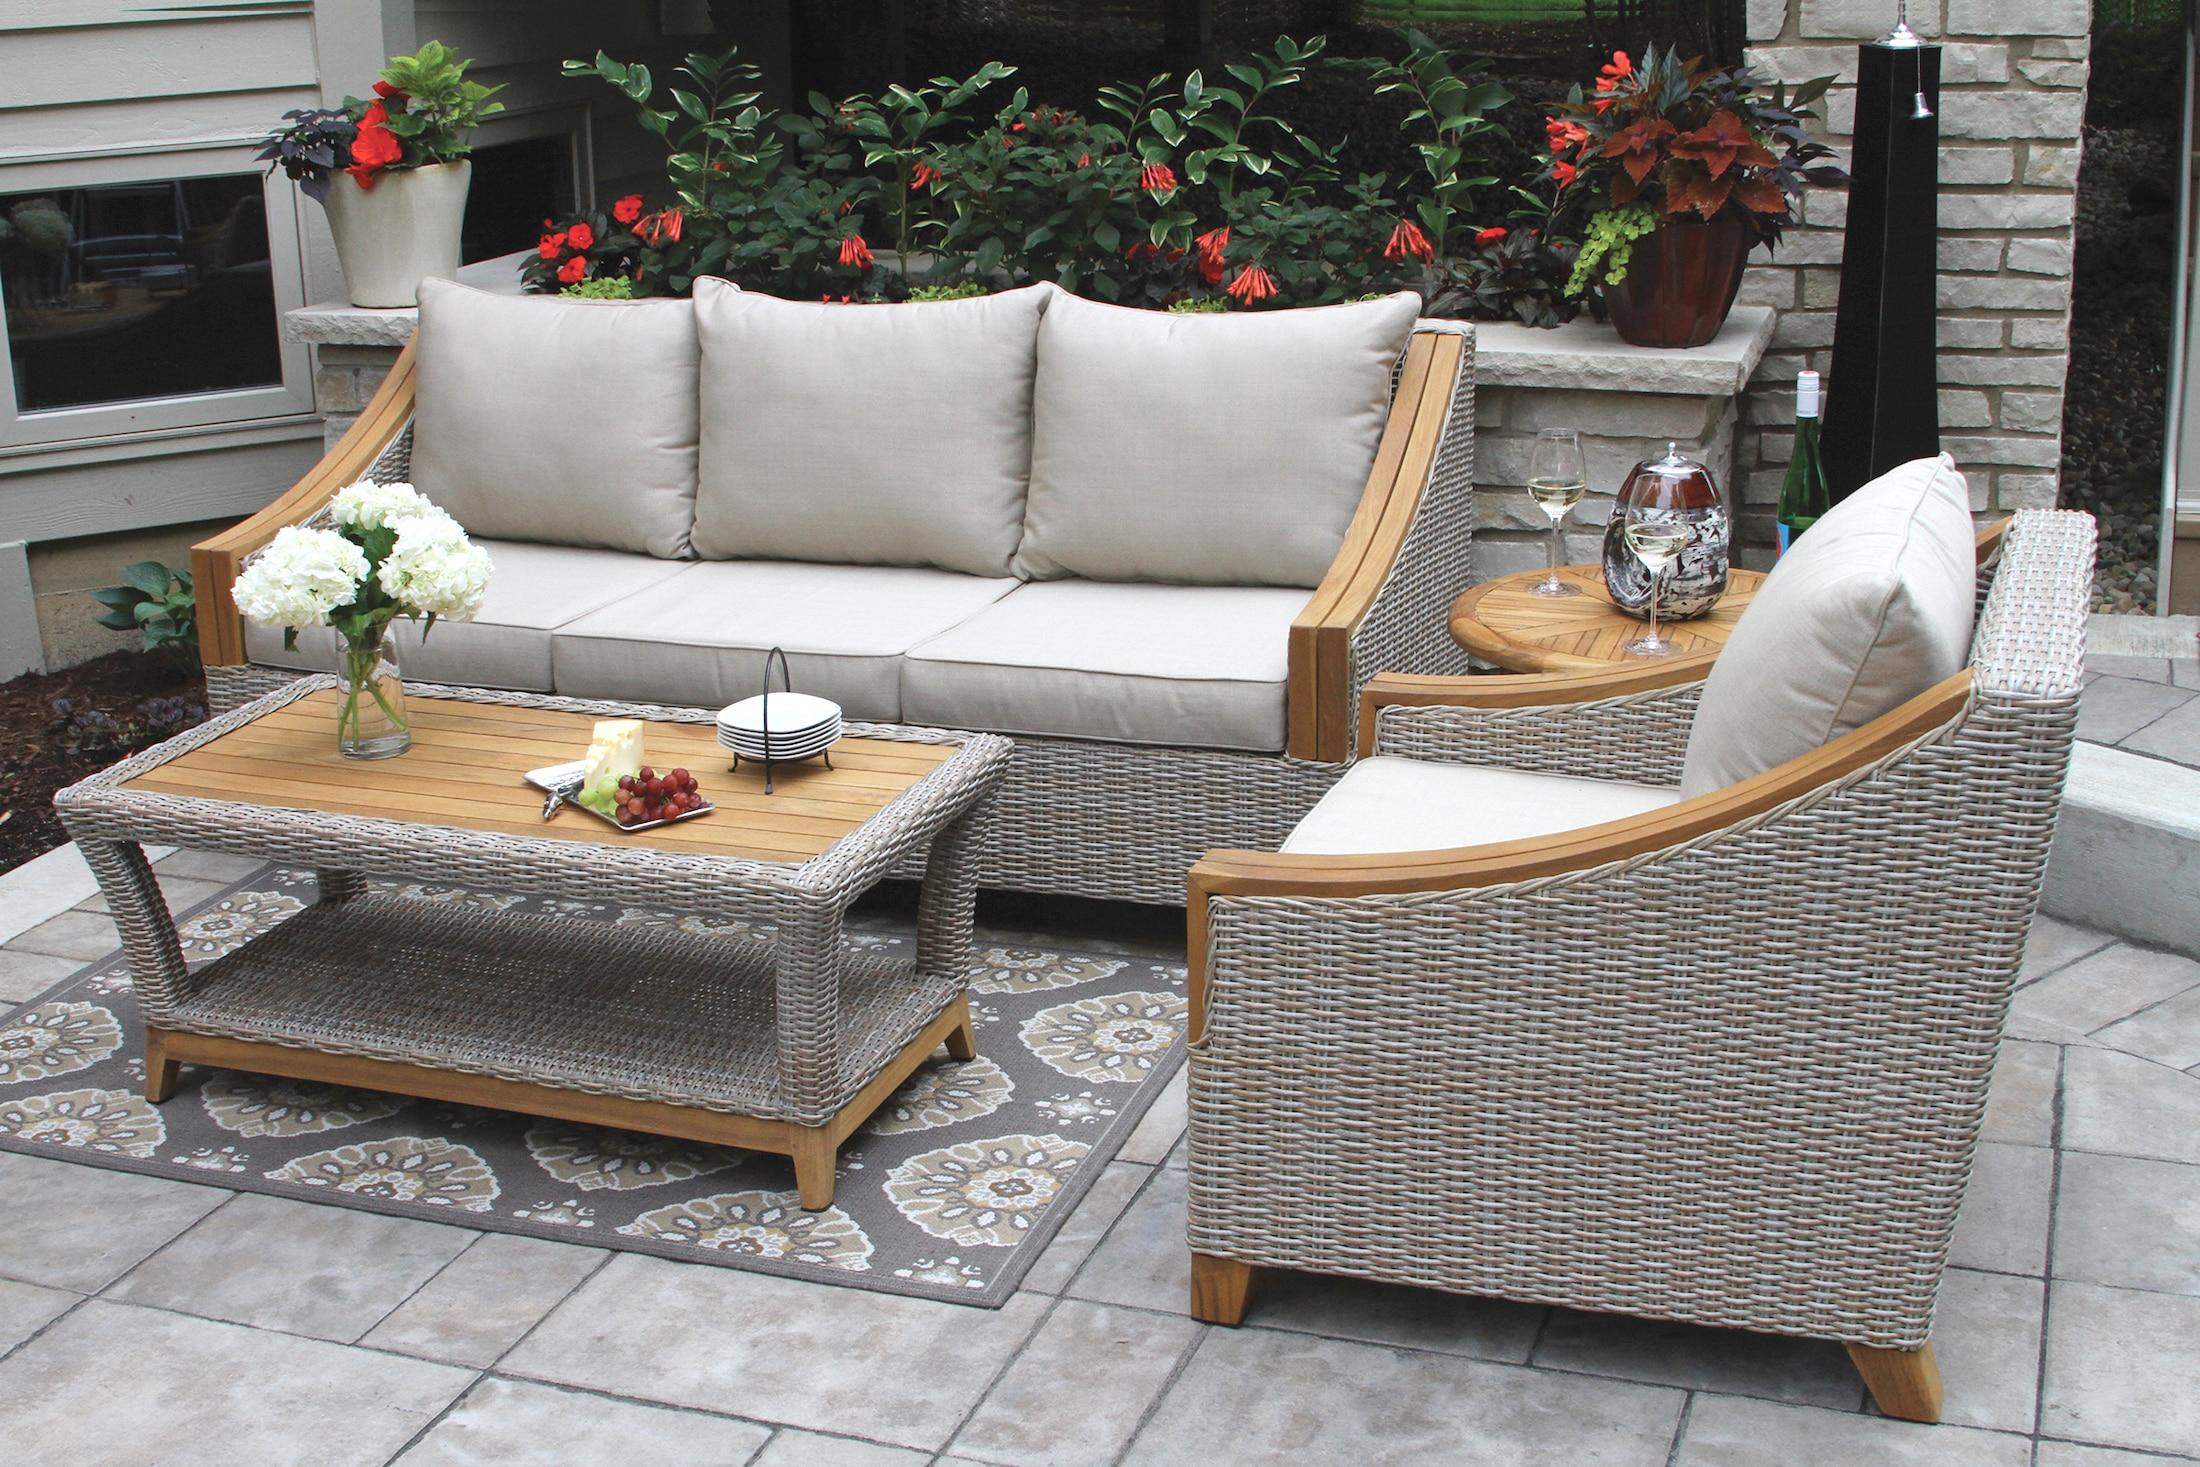 wicker furniture tna7000- wicker u0026 natural teak sofa with sunbrella cushions u0026 pillows PLUXABT